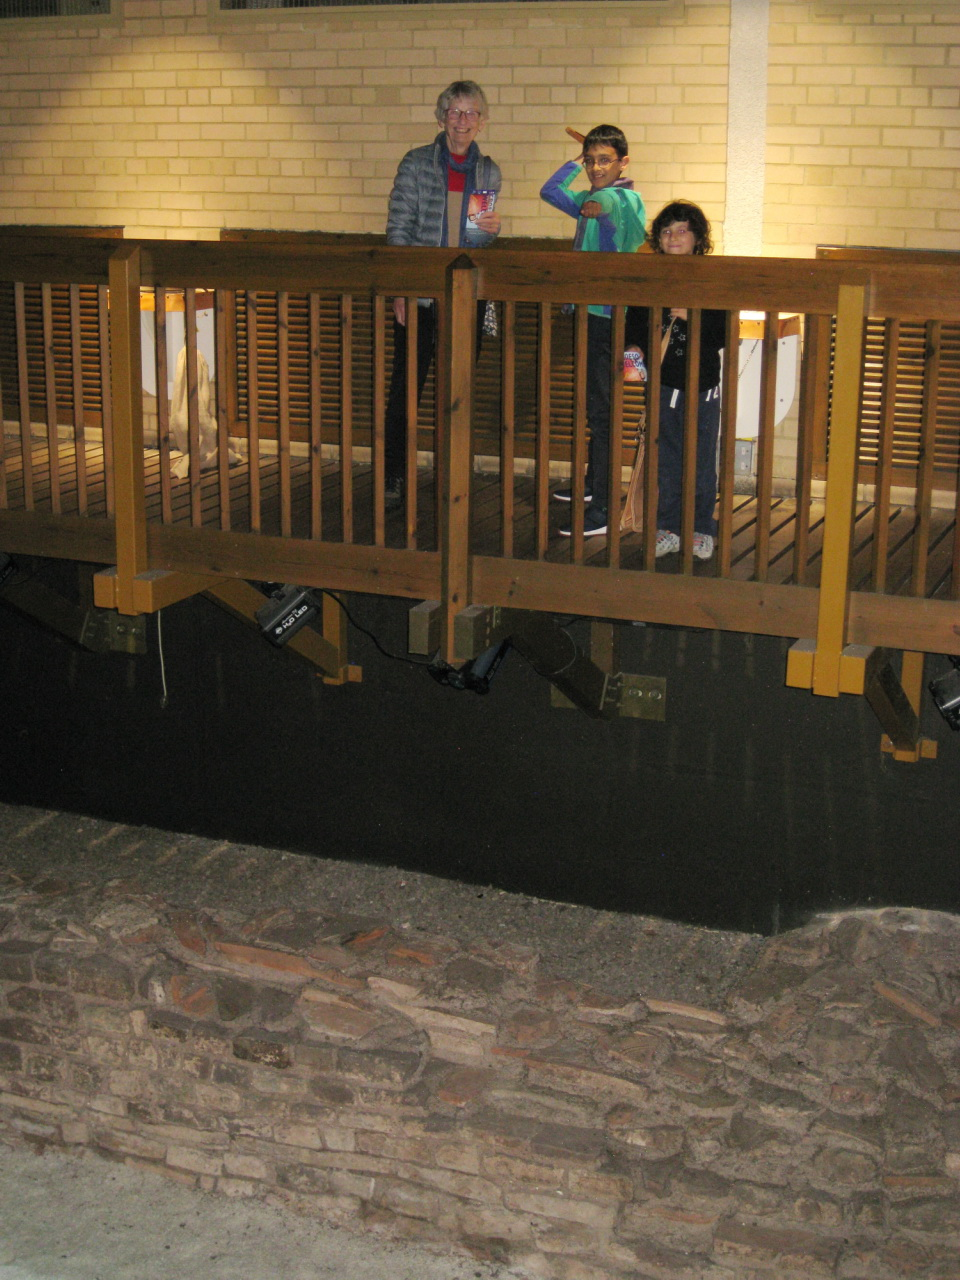 Roman baths,Caerleion